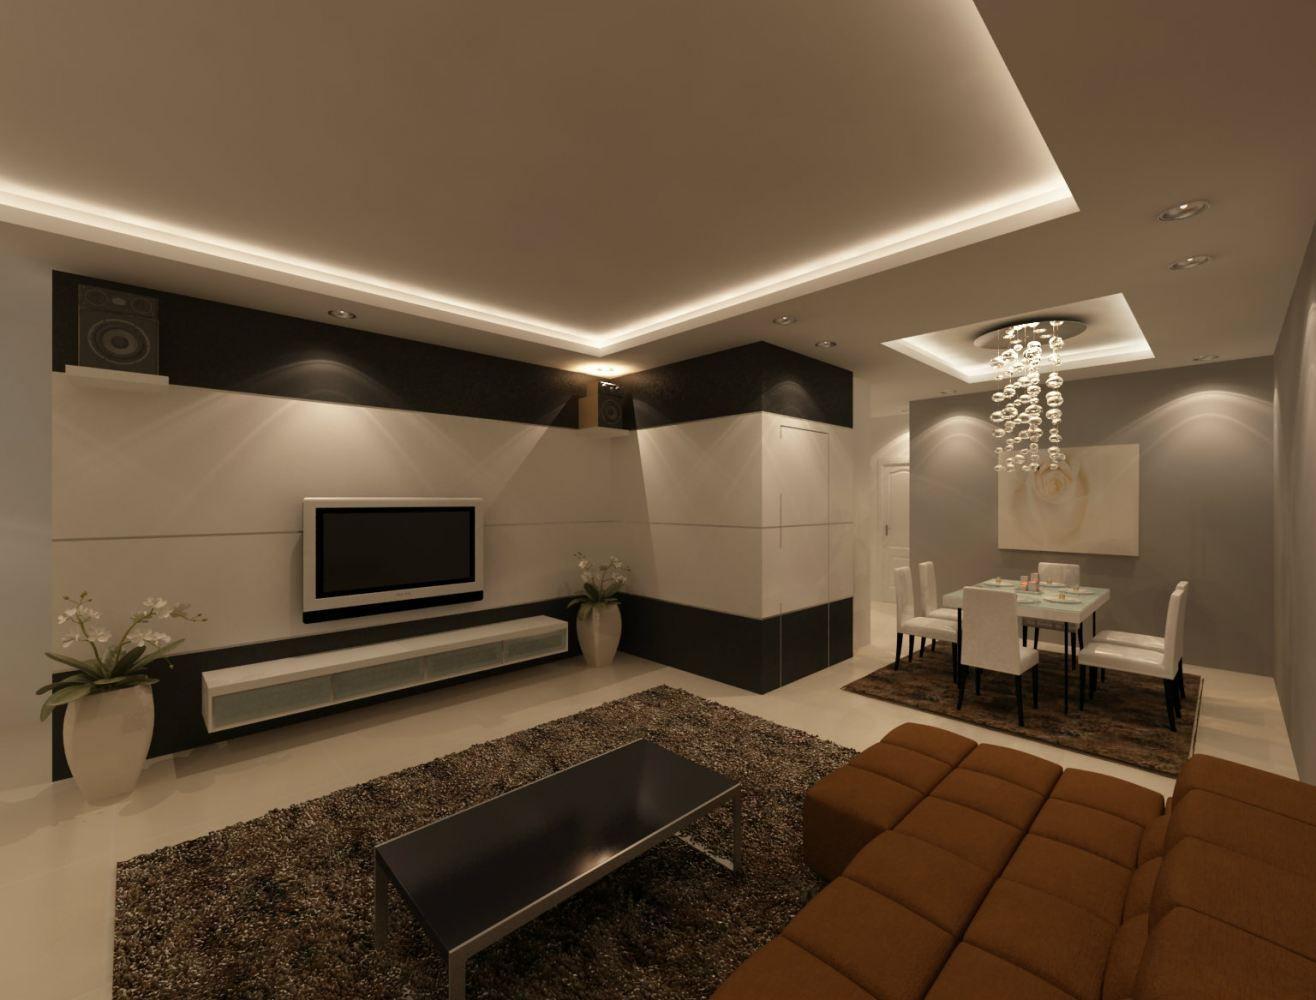 Fortune Passage Design U0026 Build Sdn Bhd   Living Johor Bahru JB Skudai Design  U0026 Renovation, We Specialist In Interior U0026 Exterior Design, All Kind Of  Ceiling ...